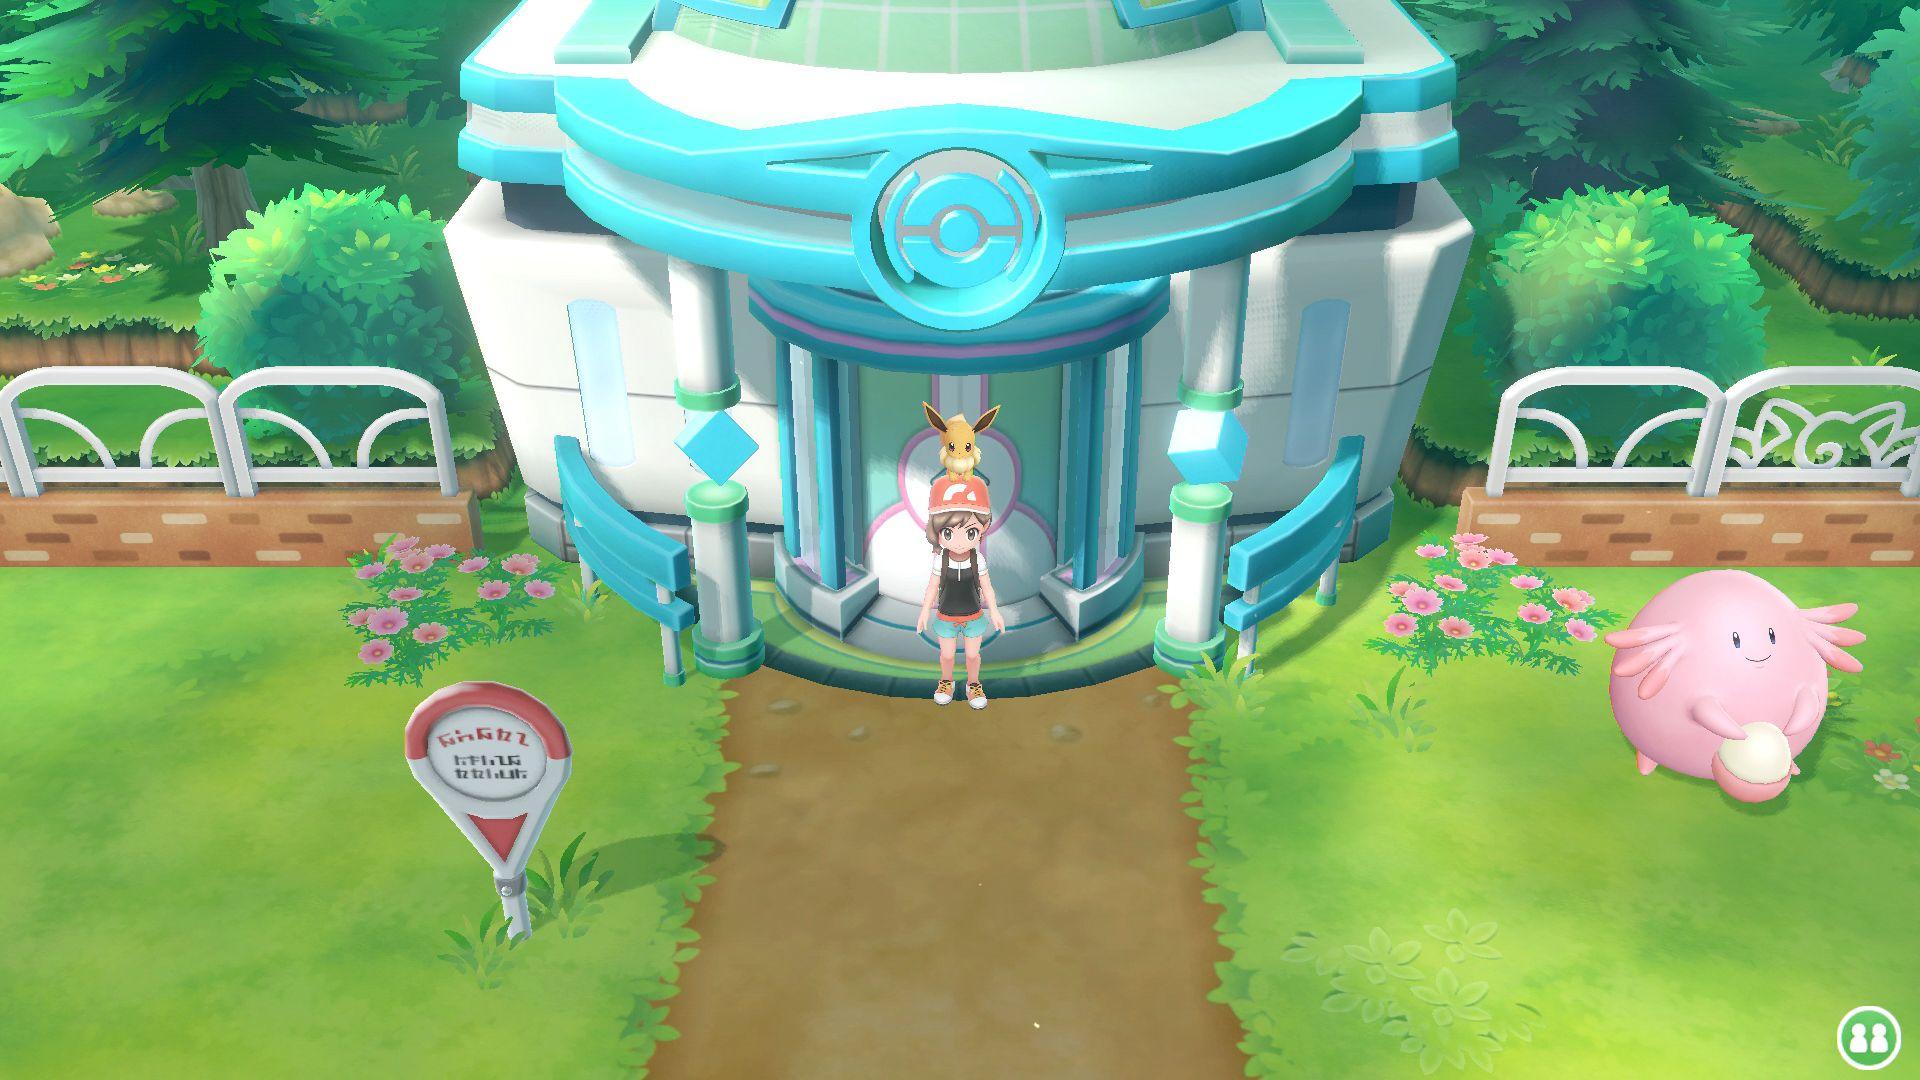 Pokemon: Let's Go, Pikachu / Eevee details and screenshots